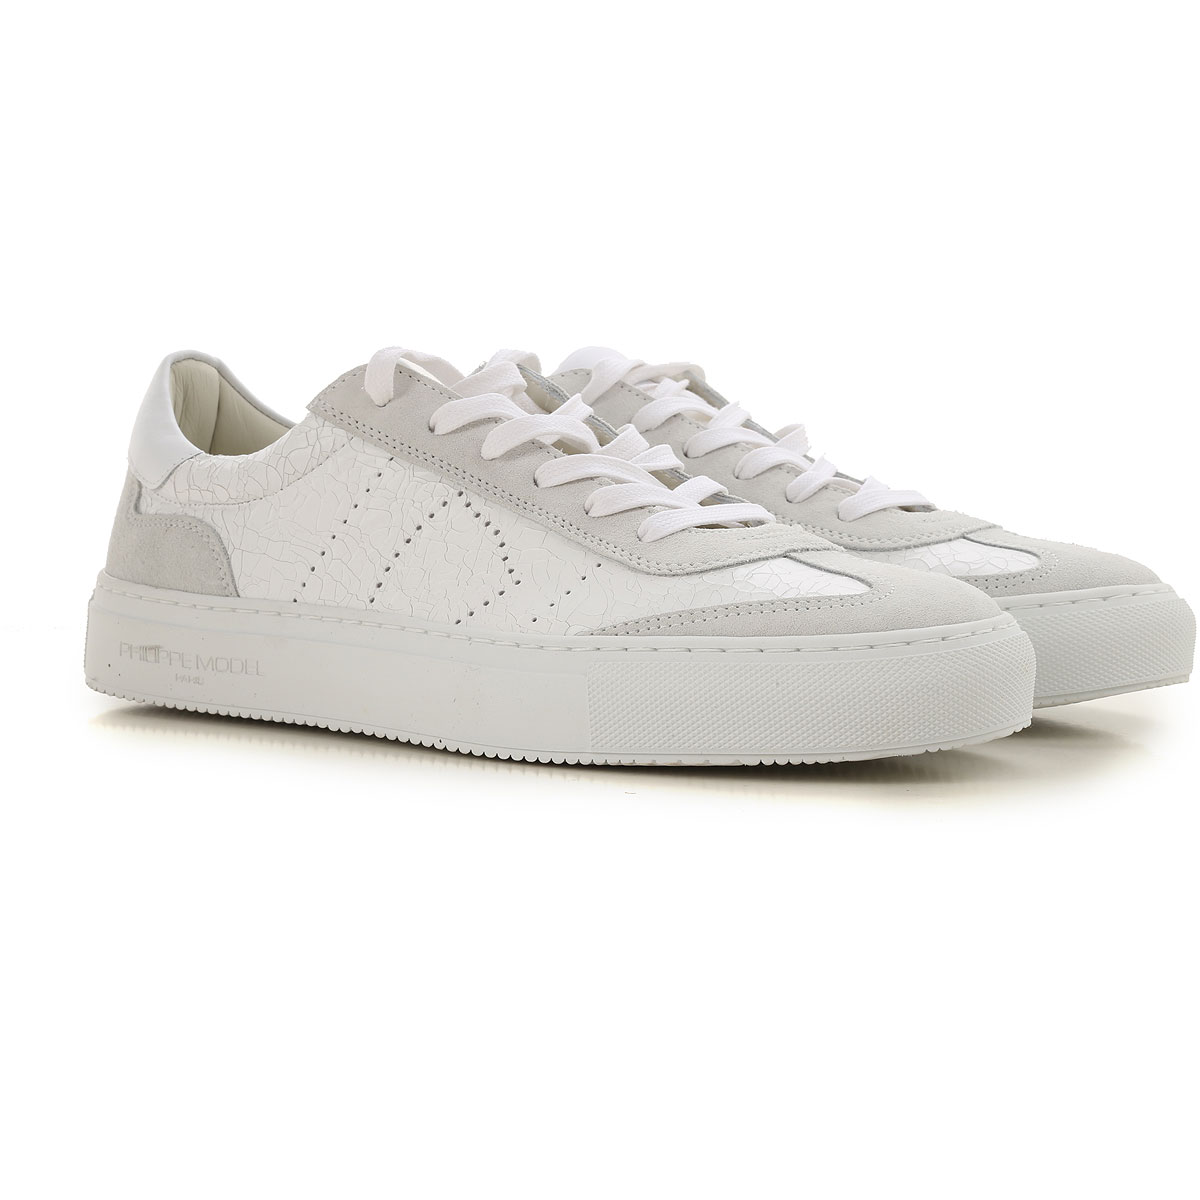 Philippe Model Sneakers for Men On Sale, White, Leather, 2019, EUR 40 - US 7 -  UK 6 EUR 41 - US 8 -  UK 7